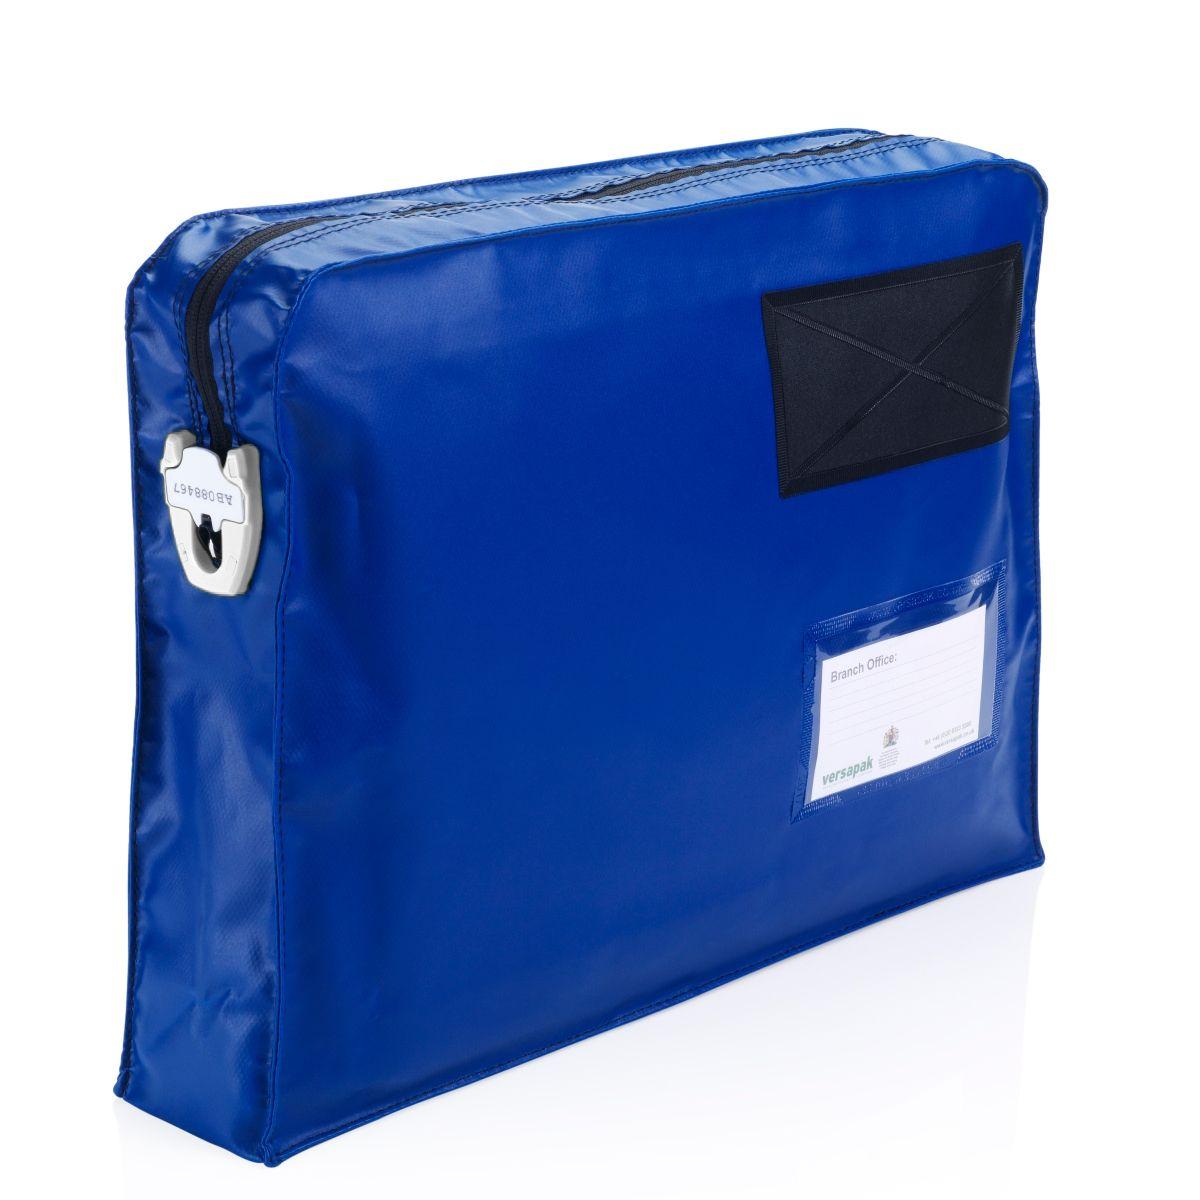 Medium Mailing Pouch - Light Duty